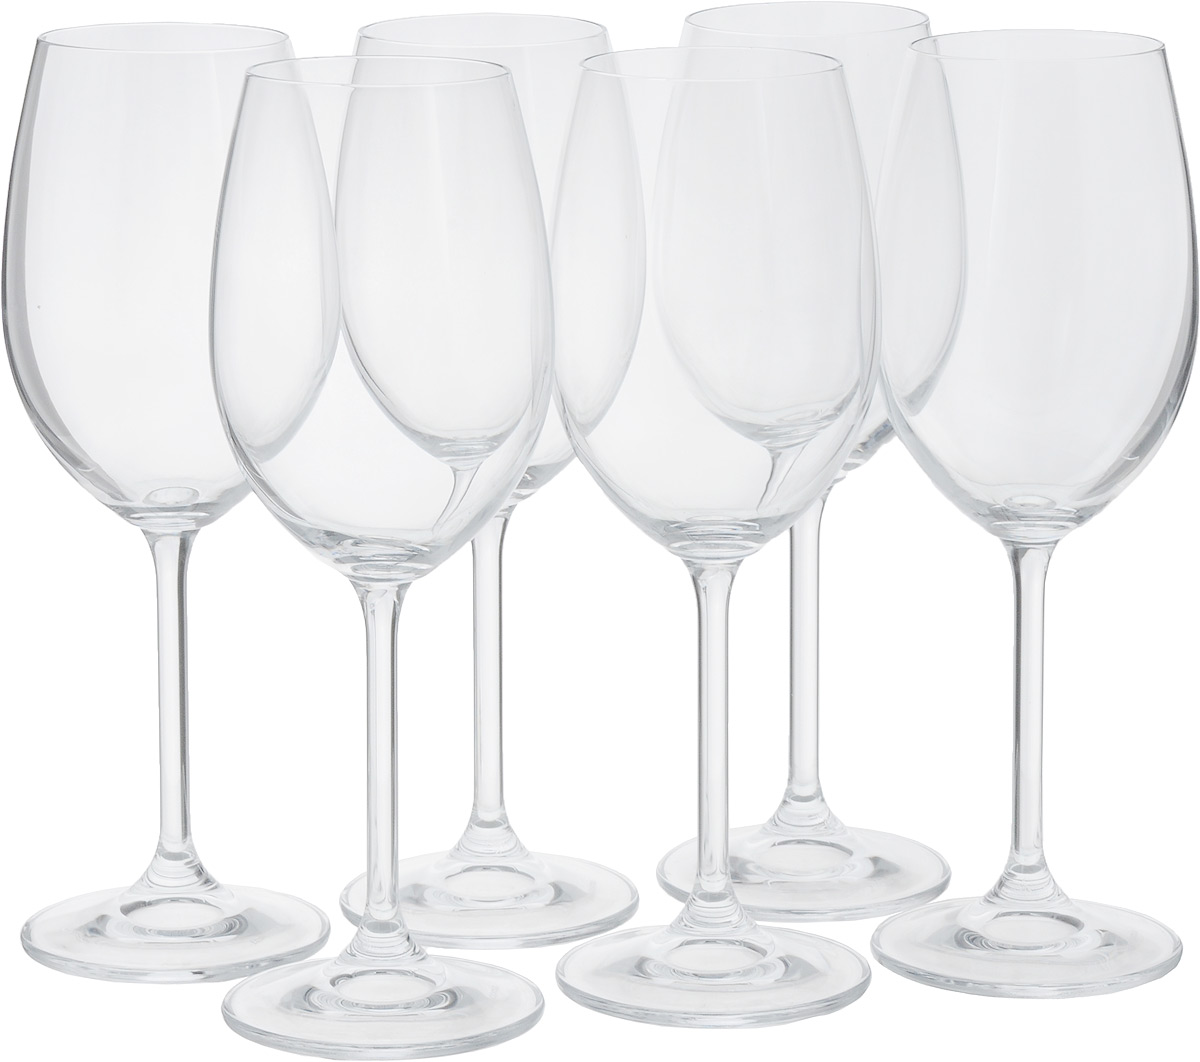 Набор бокалов для белого вина Tescoma Charlie, 350 мл, 6шт набор бокалов для бренди коралл 40600 q8105 400 анжела